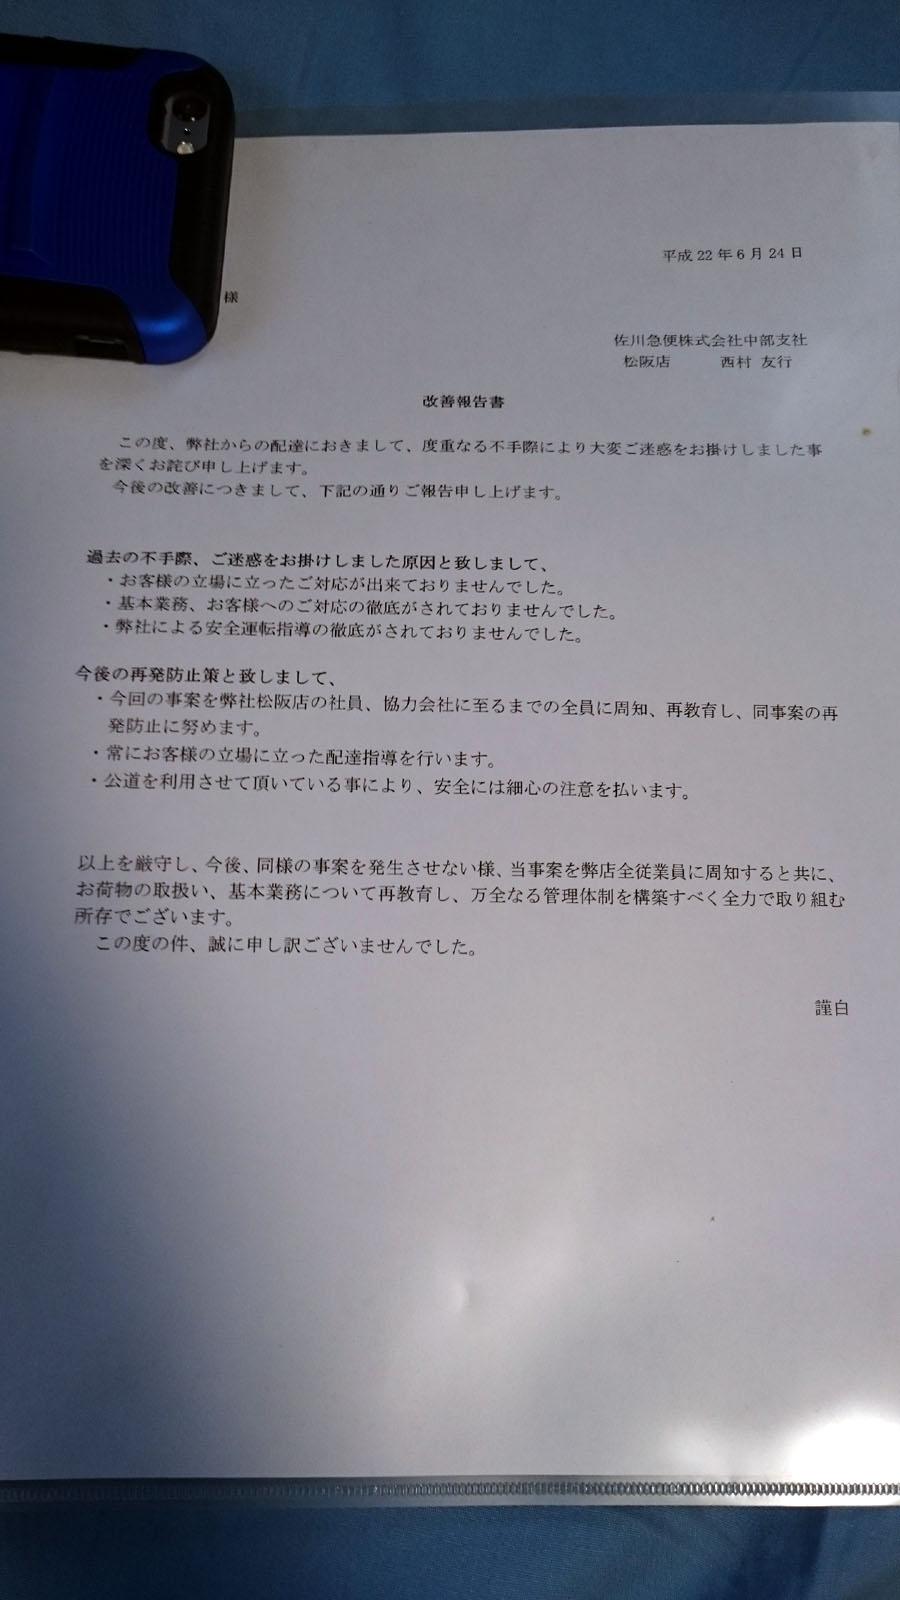 DSC_3995.JPG